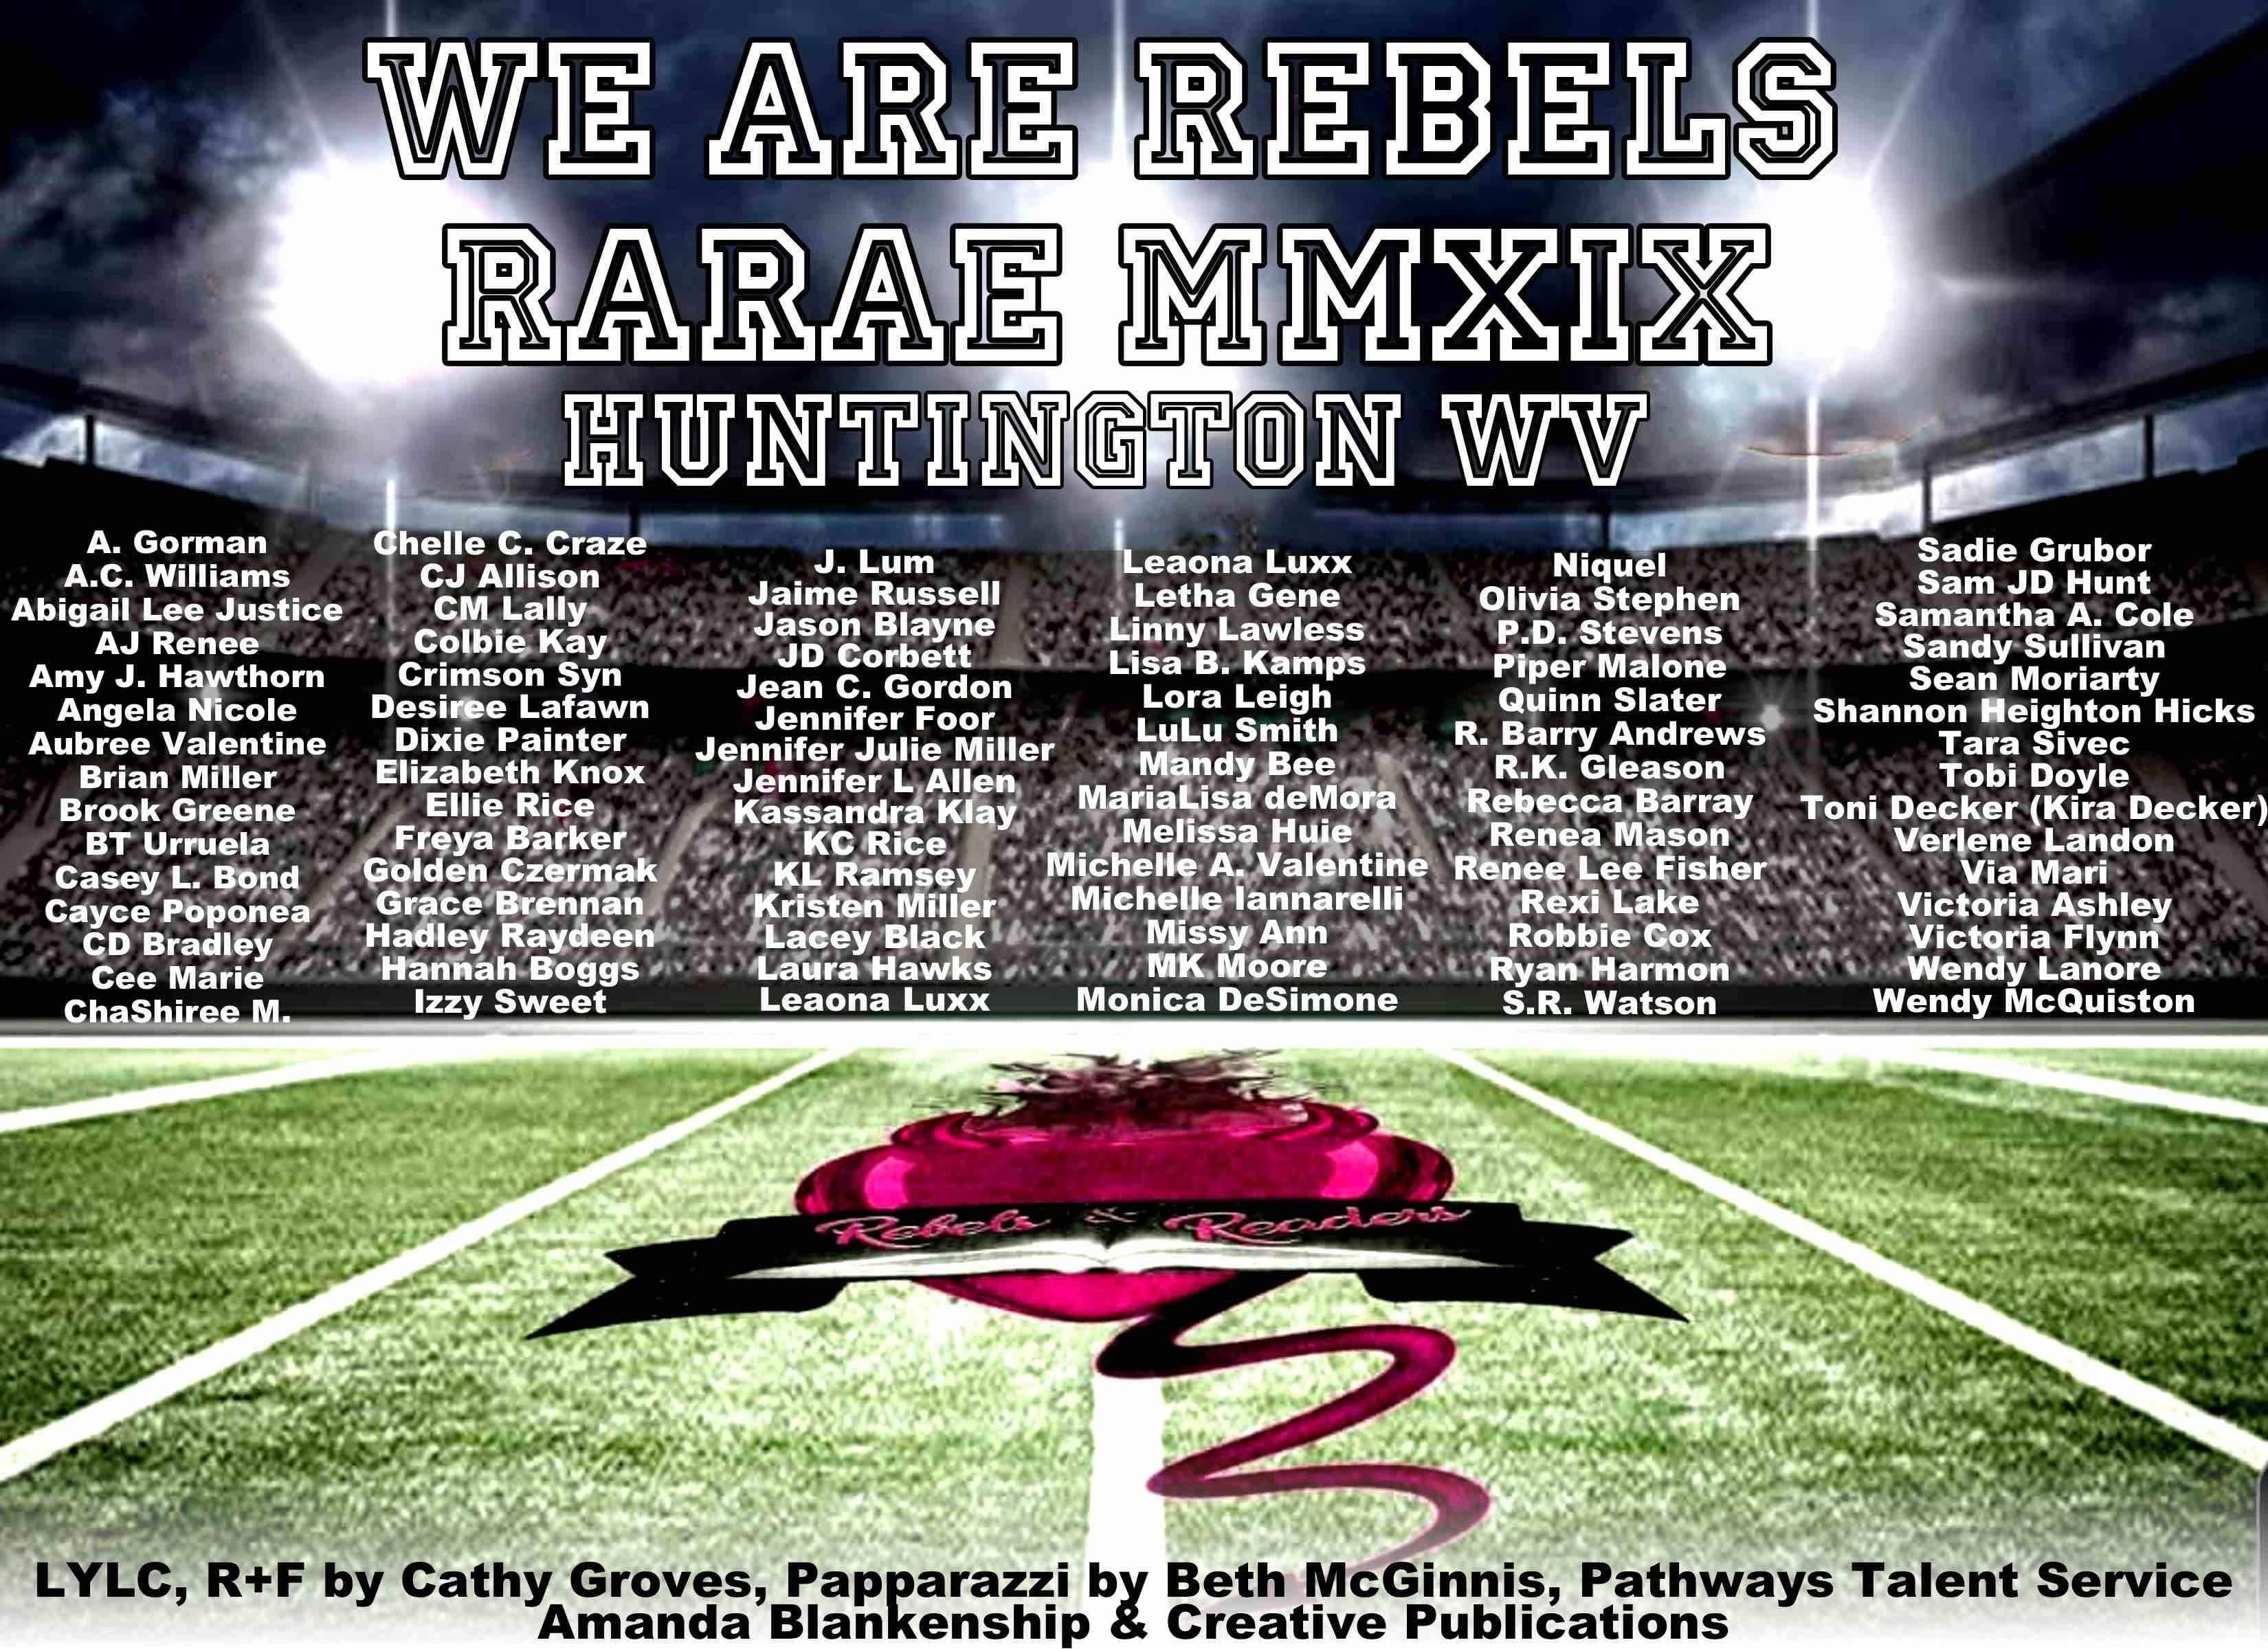 We Are Rebels Tickets Fri Nov 1 2019 At 7 00 Pm Eventbrite